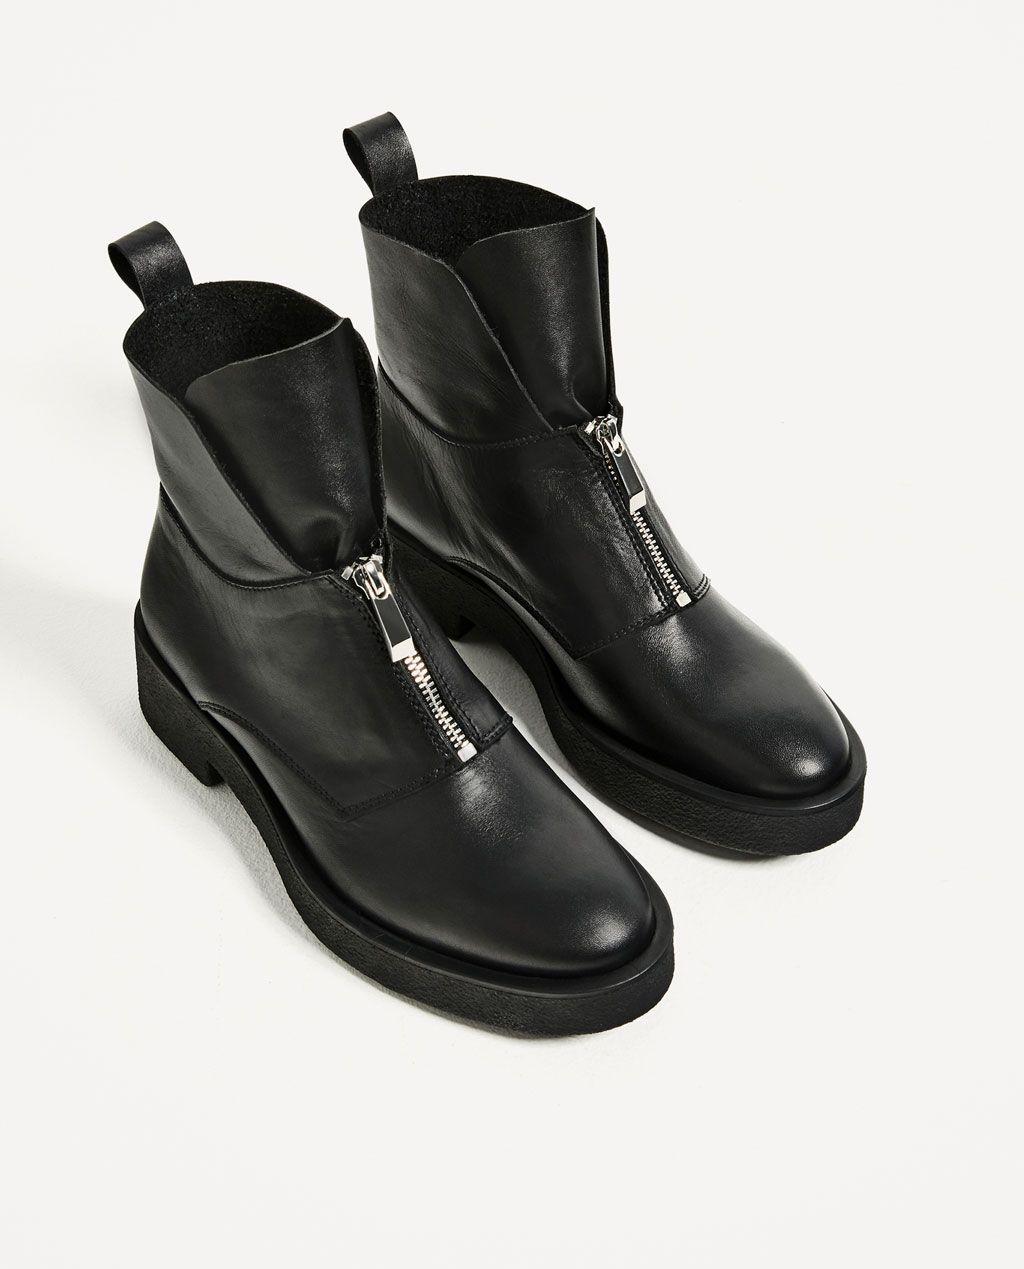 lederstiefelette mit reissverschluss leder schuhe damen zara deutschland shoes pinterest. Black Bedroom Furniture Sets. Home Design Ideas